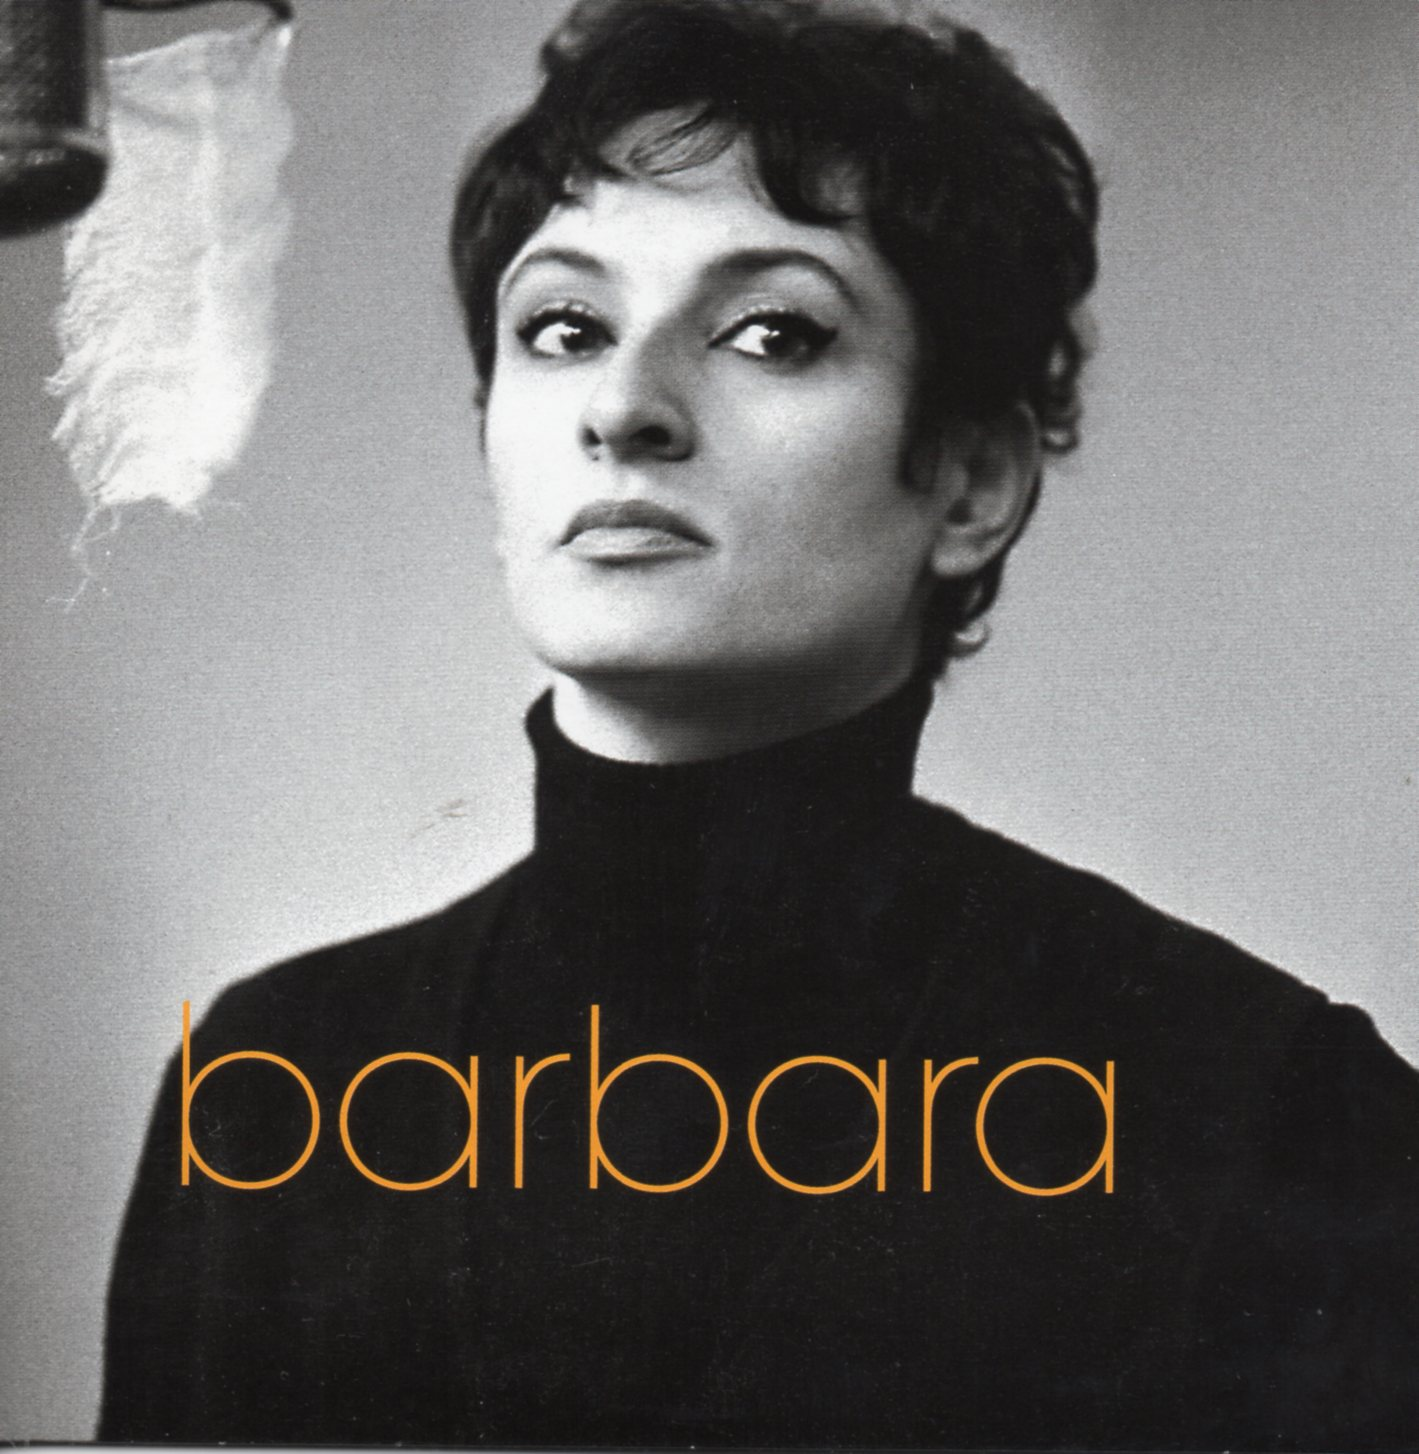 barbara 968 disques vinyle et cd sur cdandlp. Black Bedroom Furniture Sets. Home Design Ideas